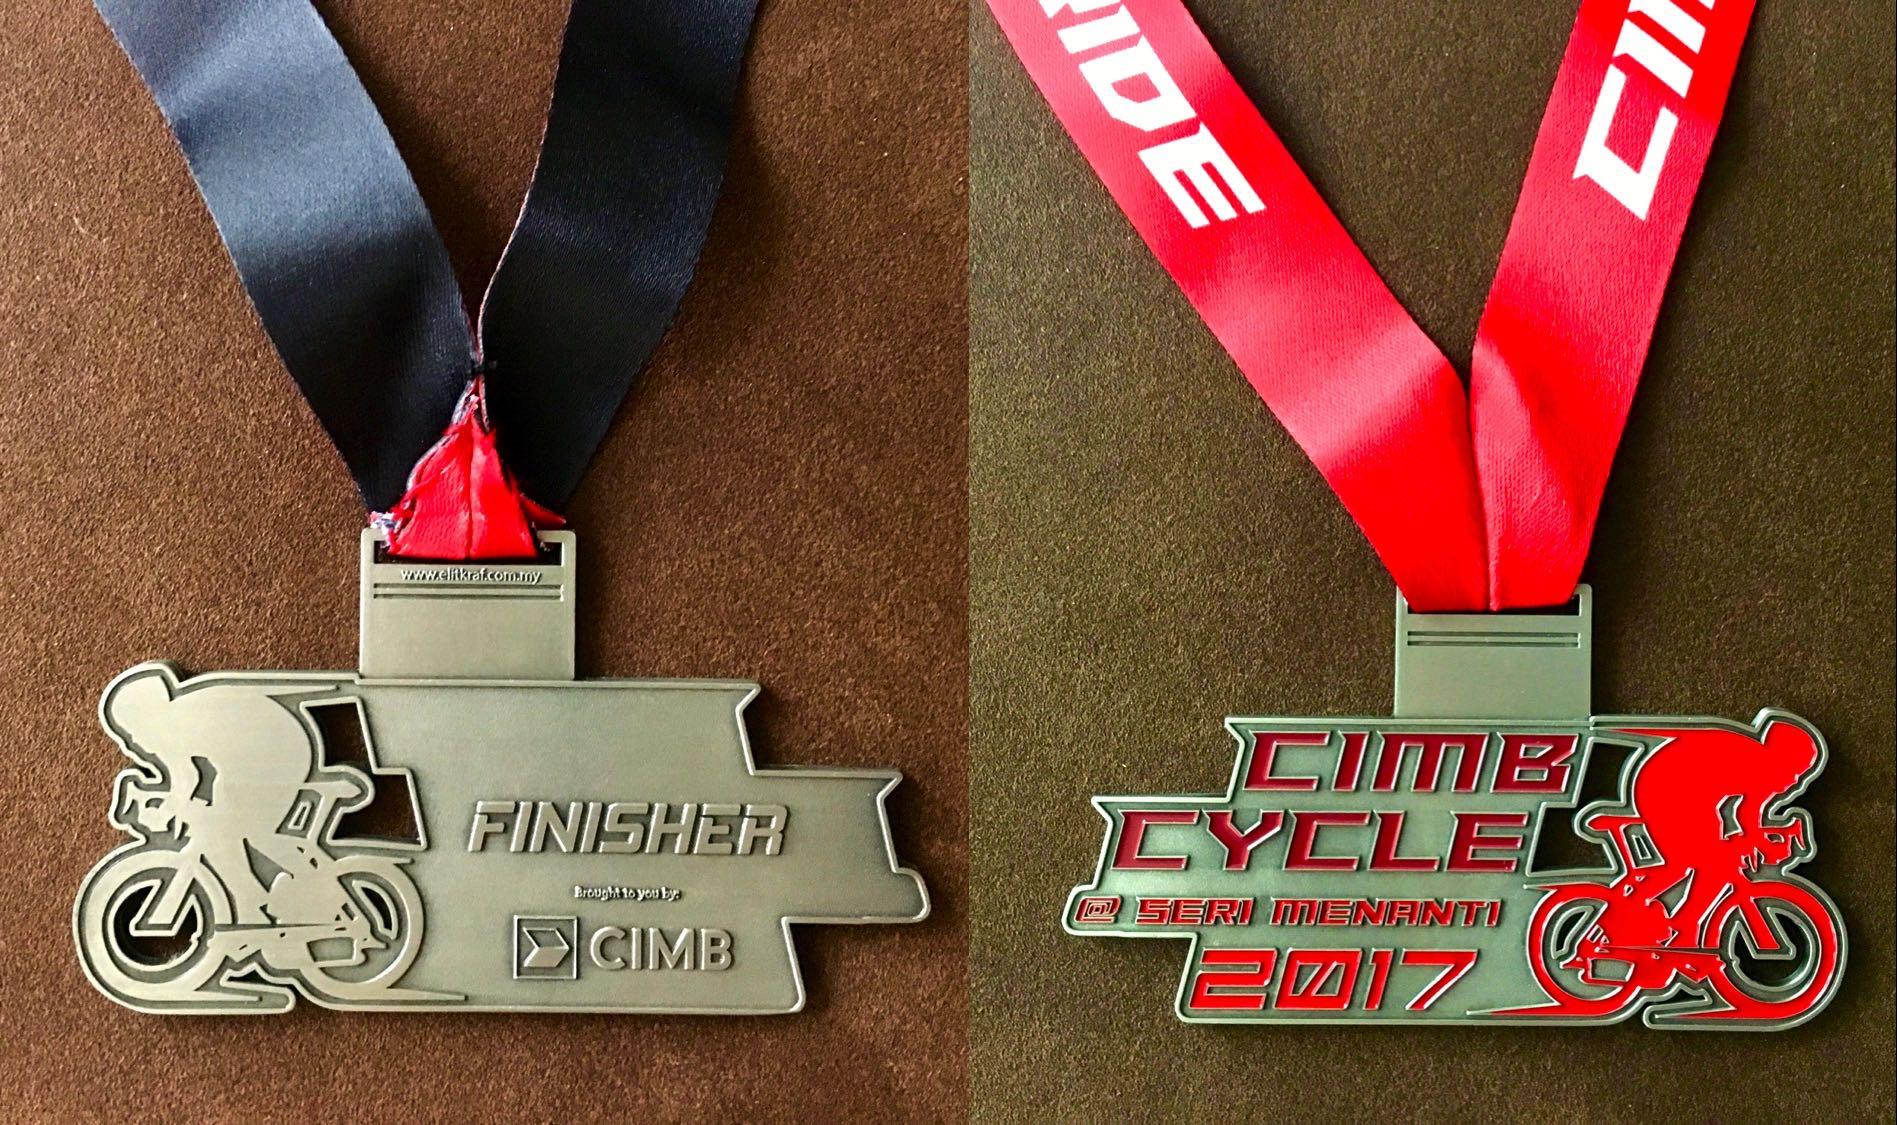 CIMB Medal